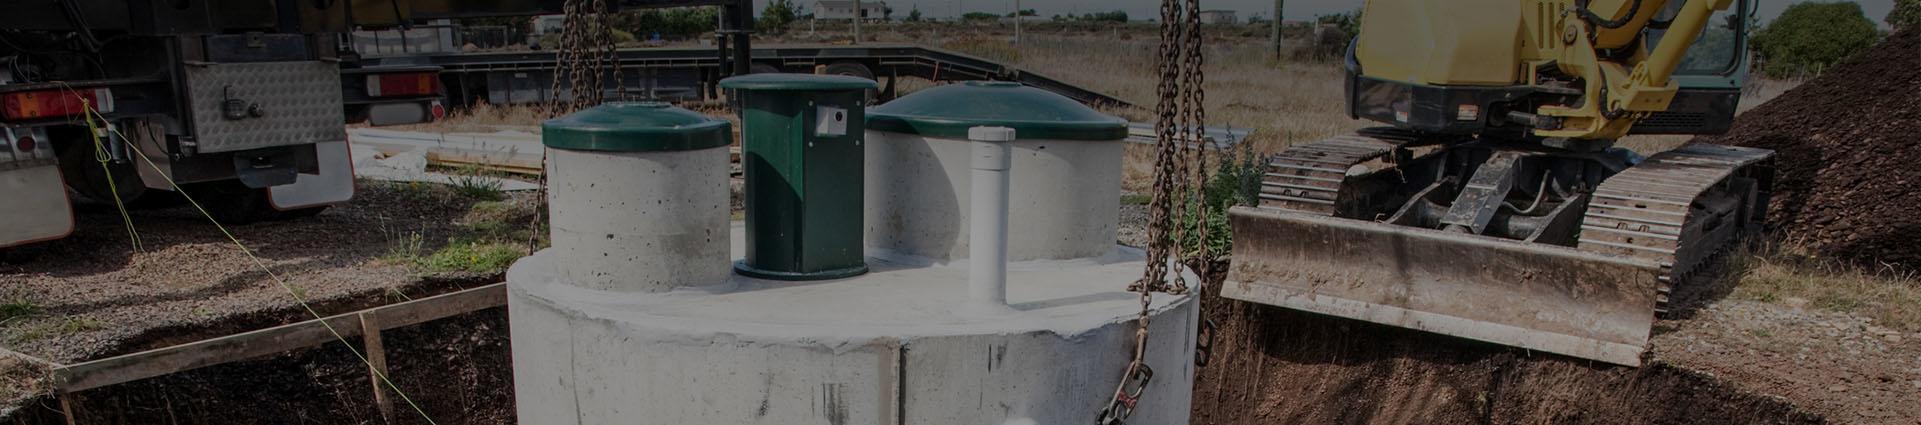 montaż zbiornika na szambo